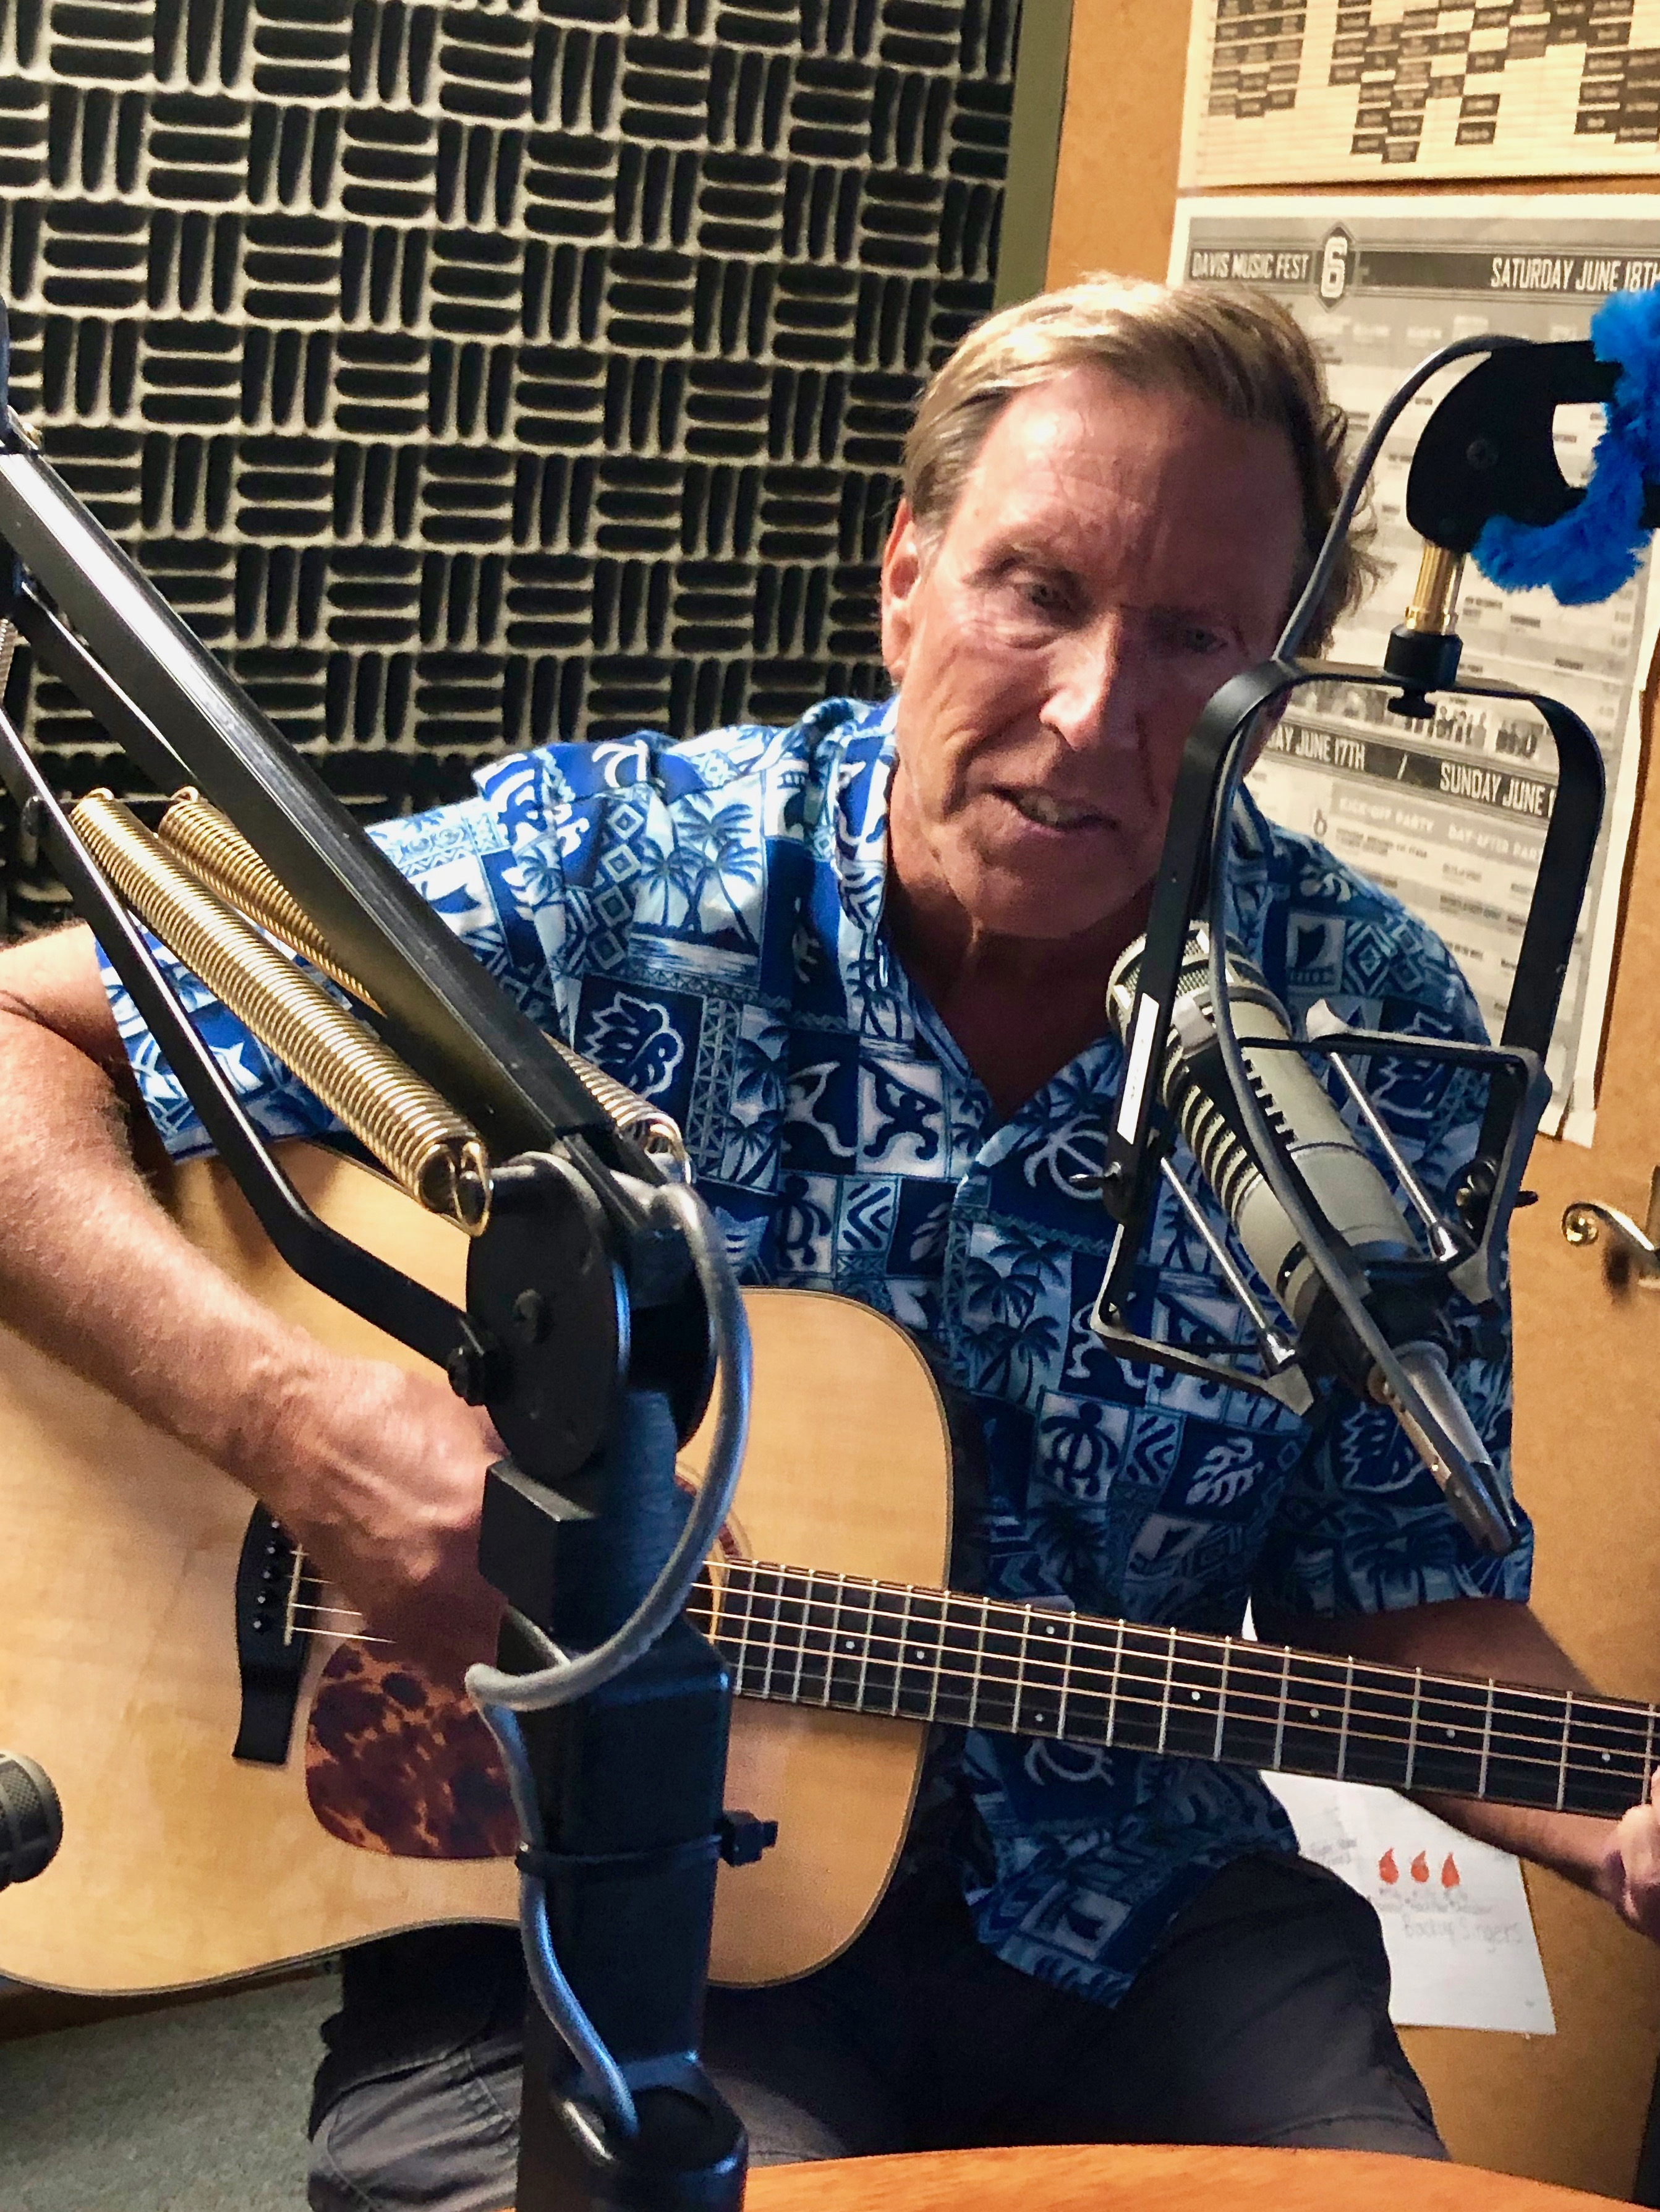 Greg Johnson, Listening Lyrics, KDRT, Pieter Pastoor